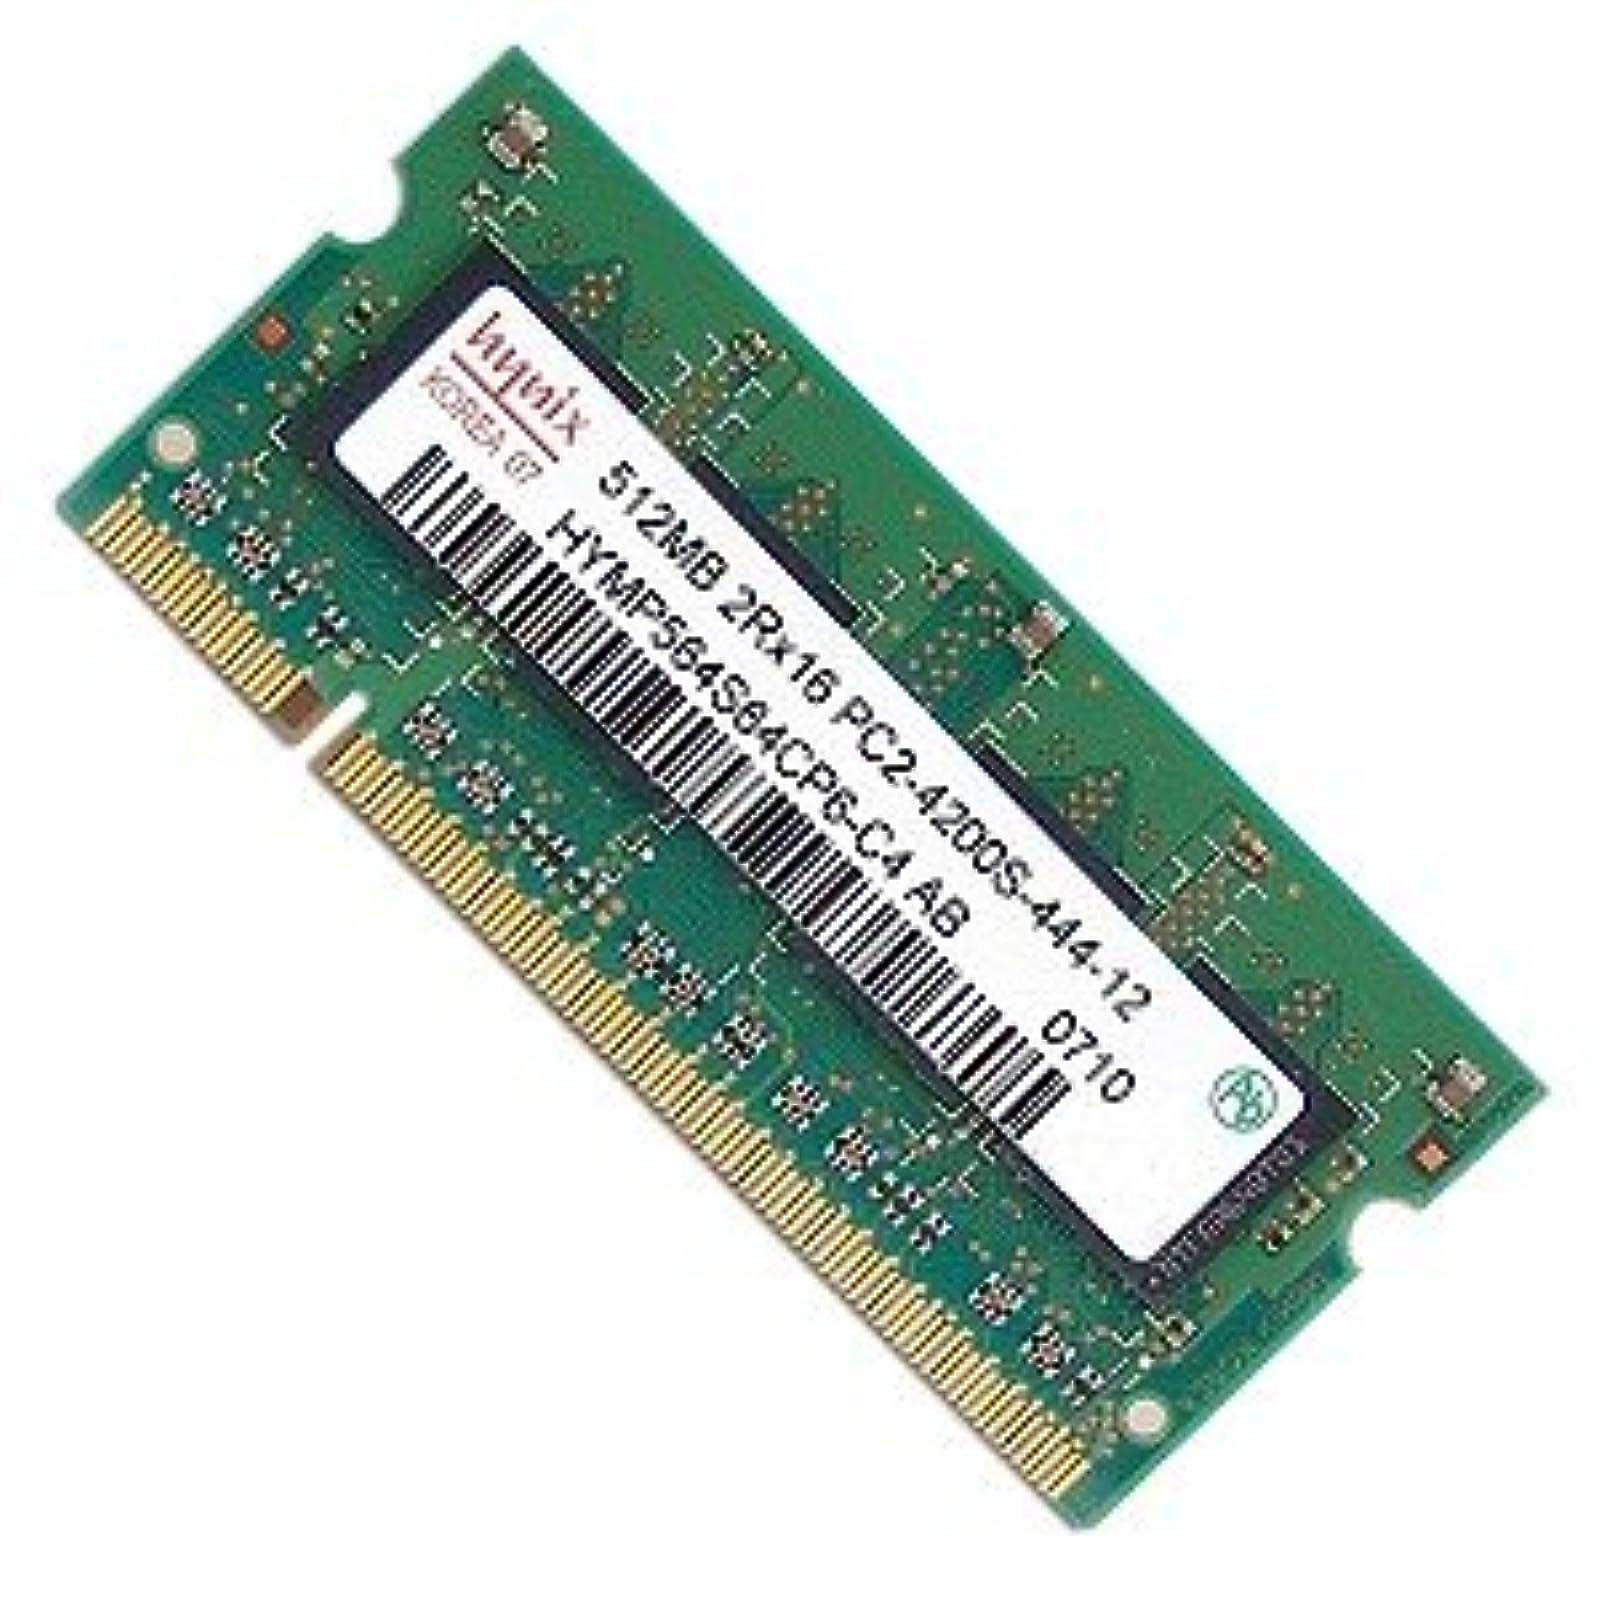 Hynix 512 MB DDR2 Ram SODIMM DDR2 PC2-4200 533 MHz 200-PIN